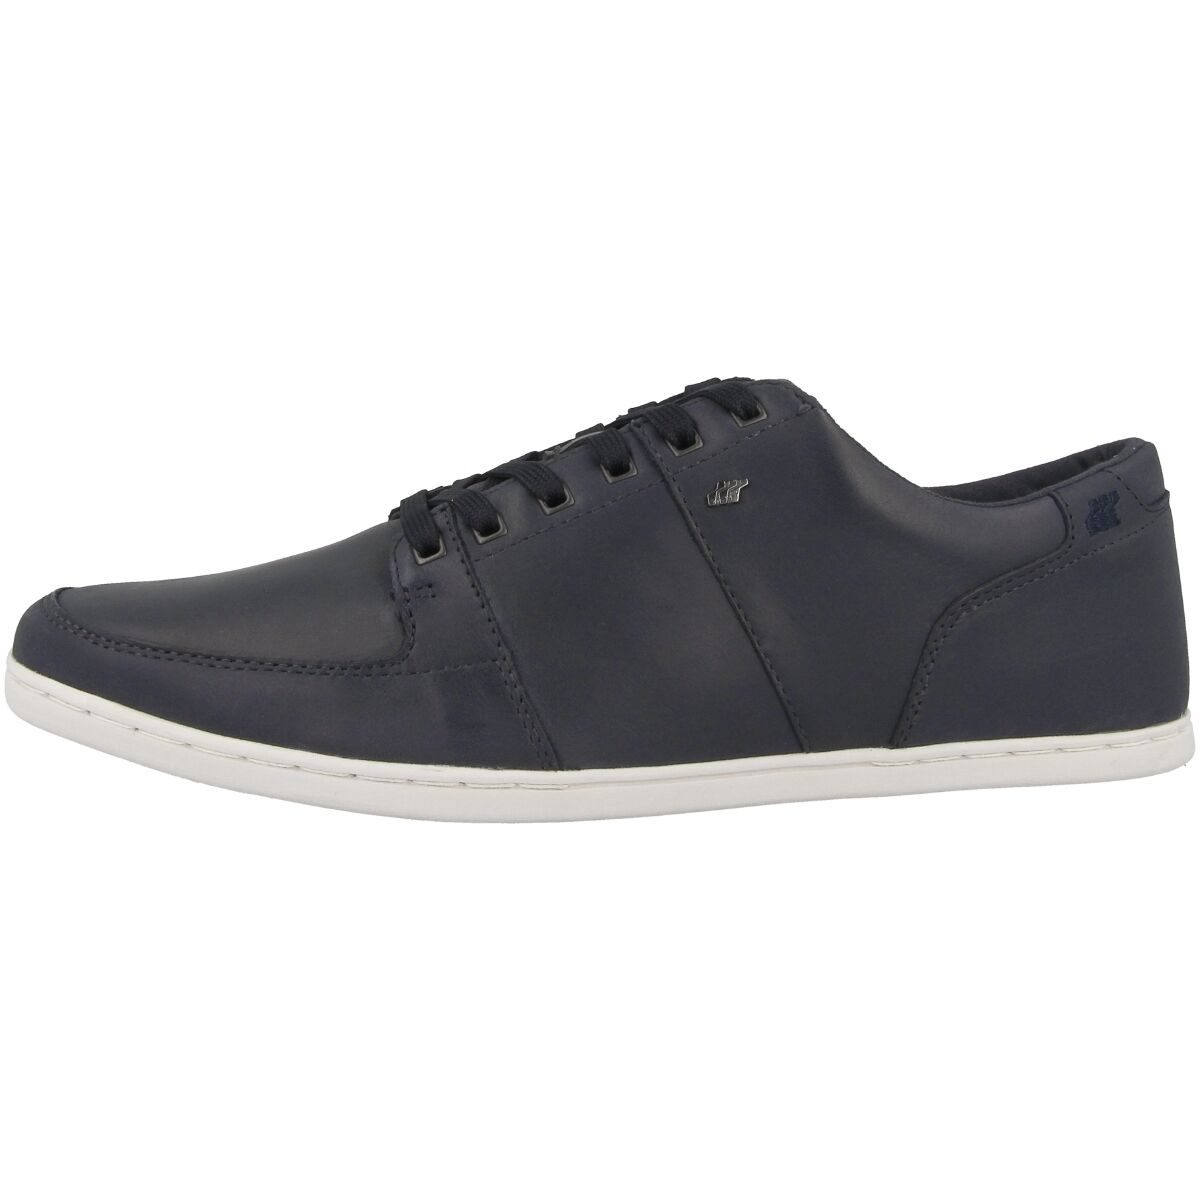 Boxfresh Spencer ICN Vachetta Leather Sneaker Schuhe navy E15199 Sparko Swich